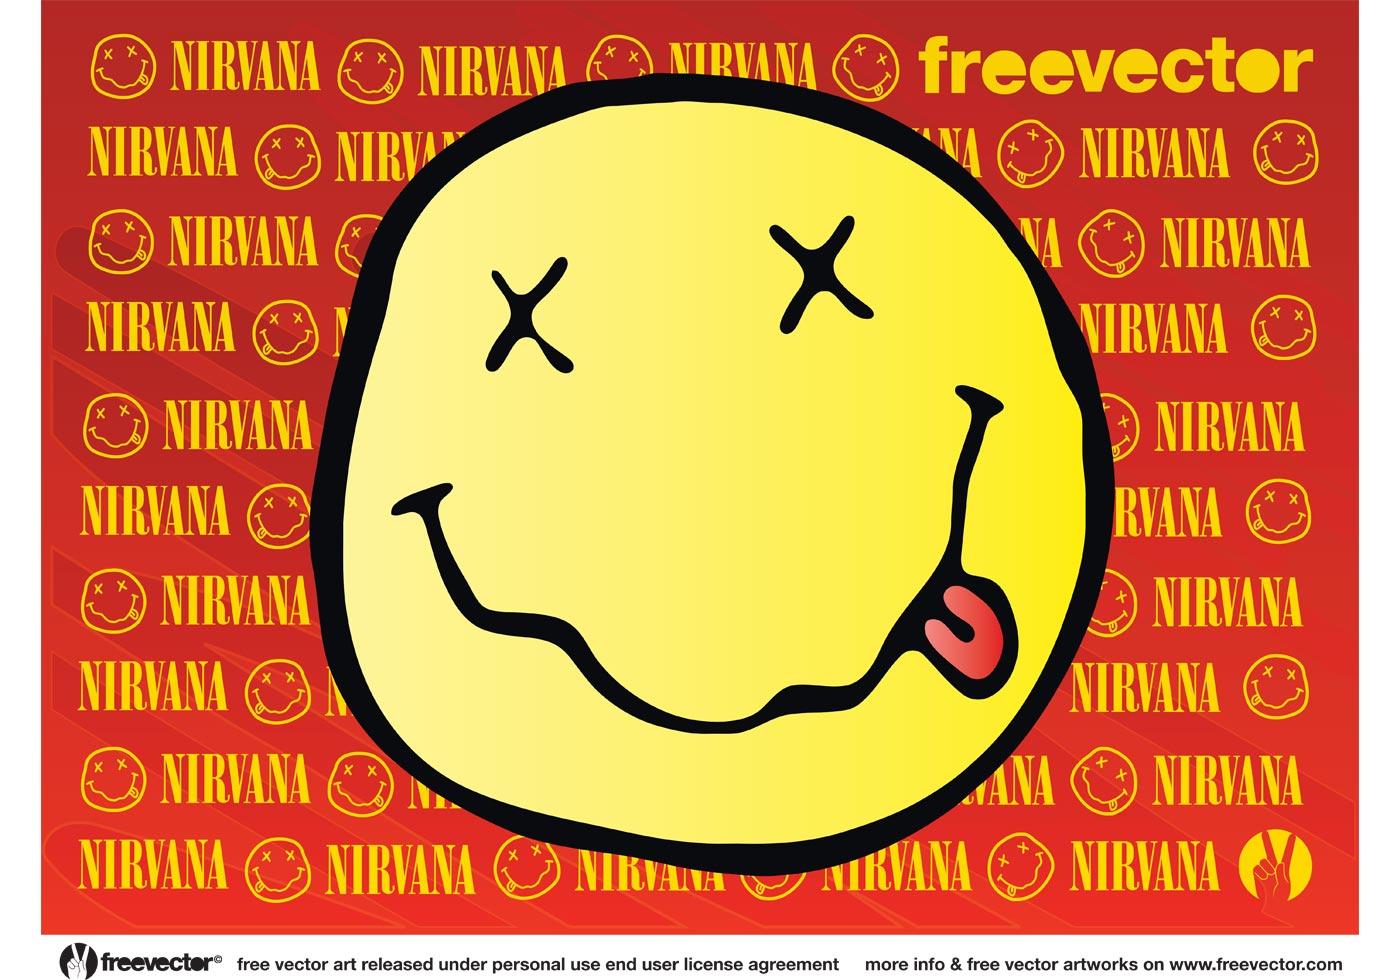 Nirvana Free Vector Art - (871 Free Downloads)